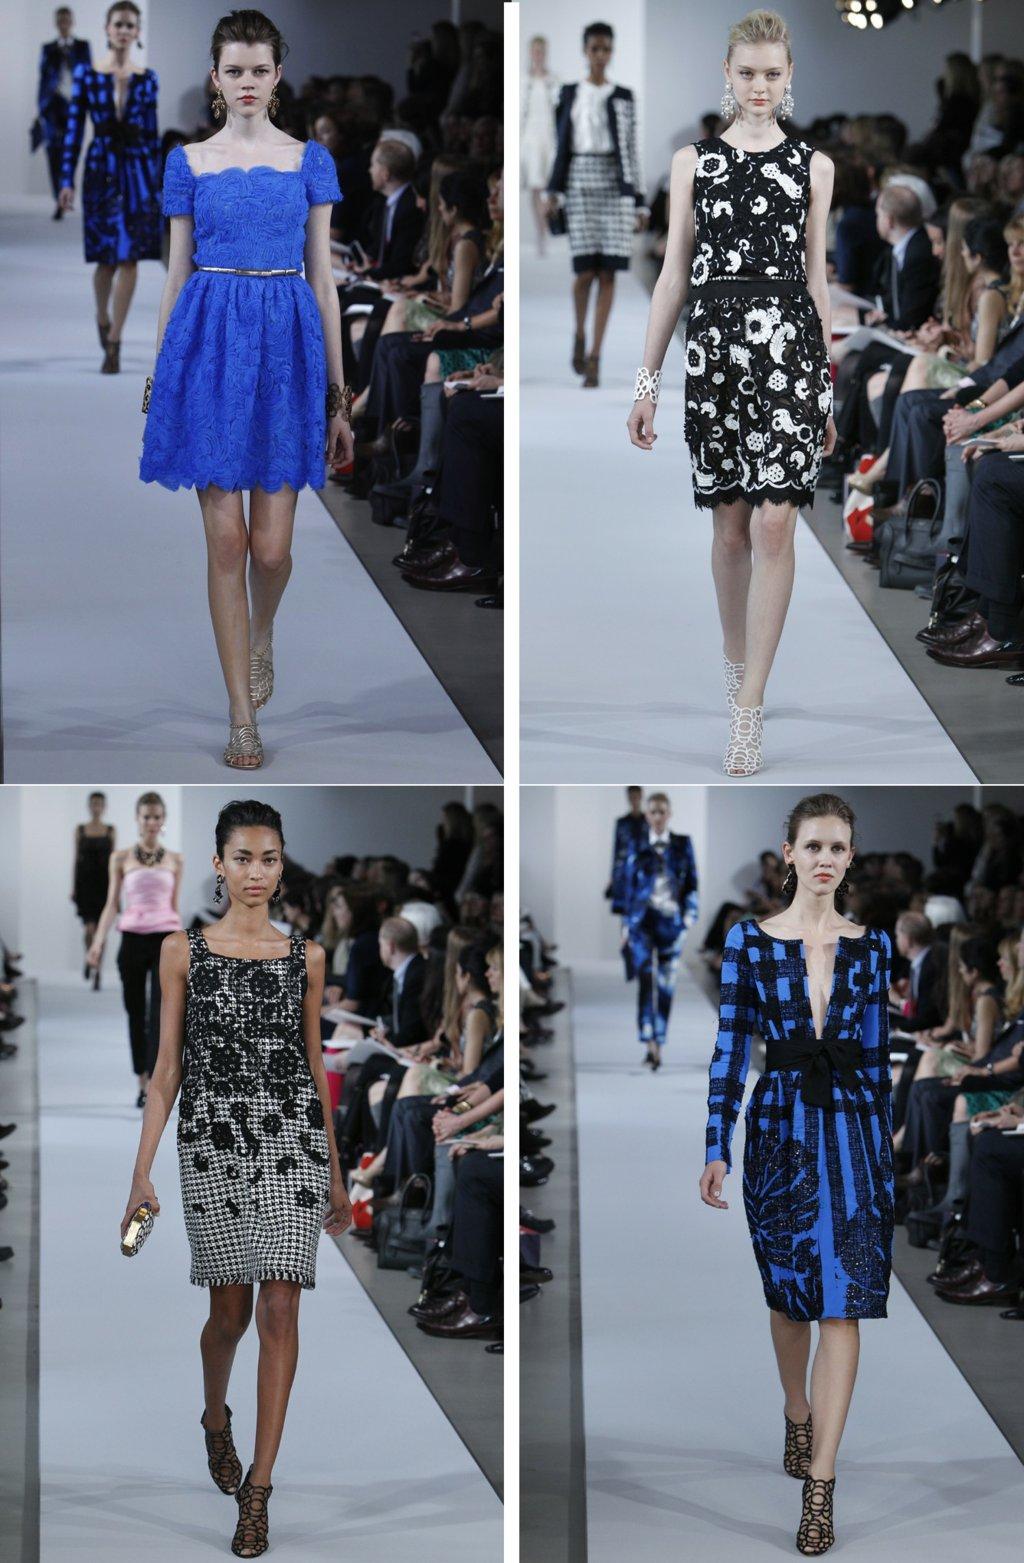 Bridesmaid-dress-inspiration-oscar-de-la-renta-bright-blue-black-white-patterned-dresses.full